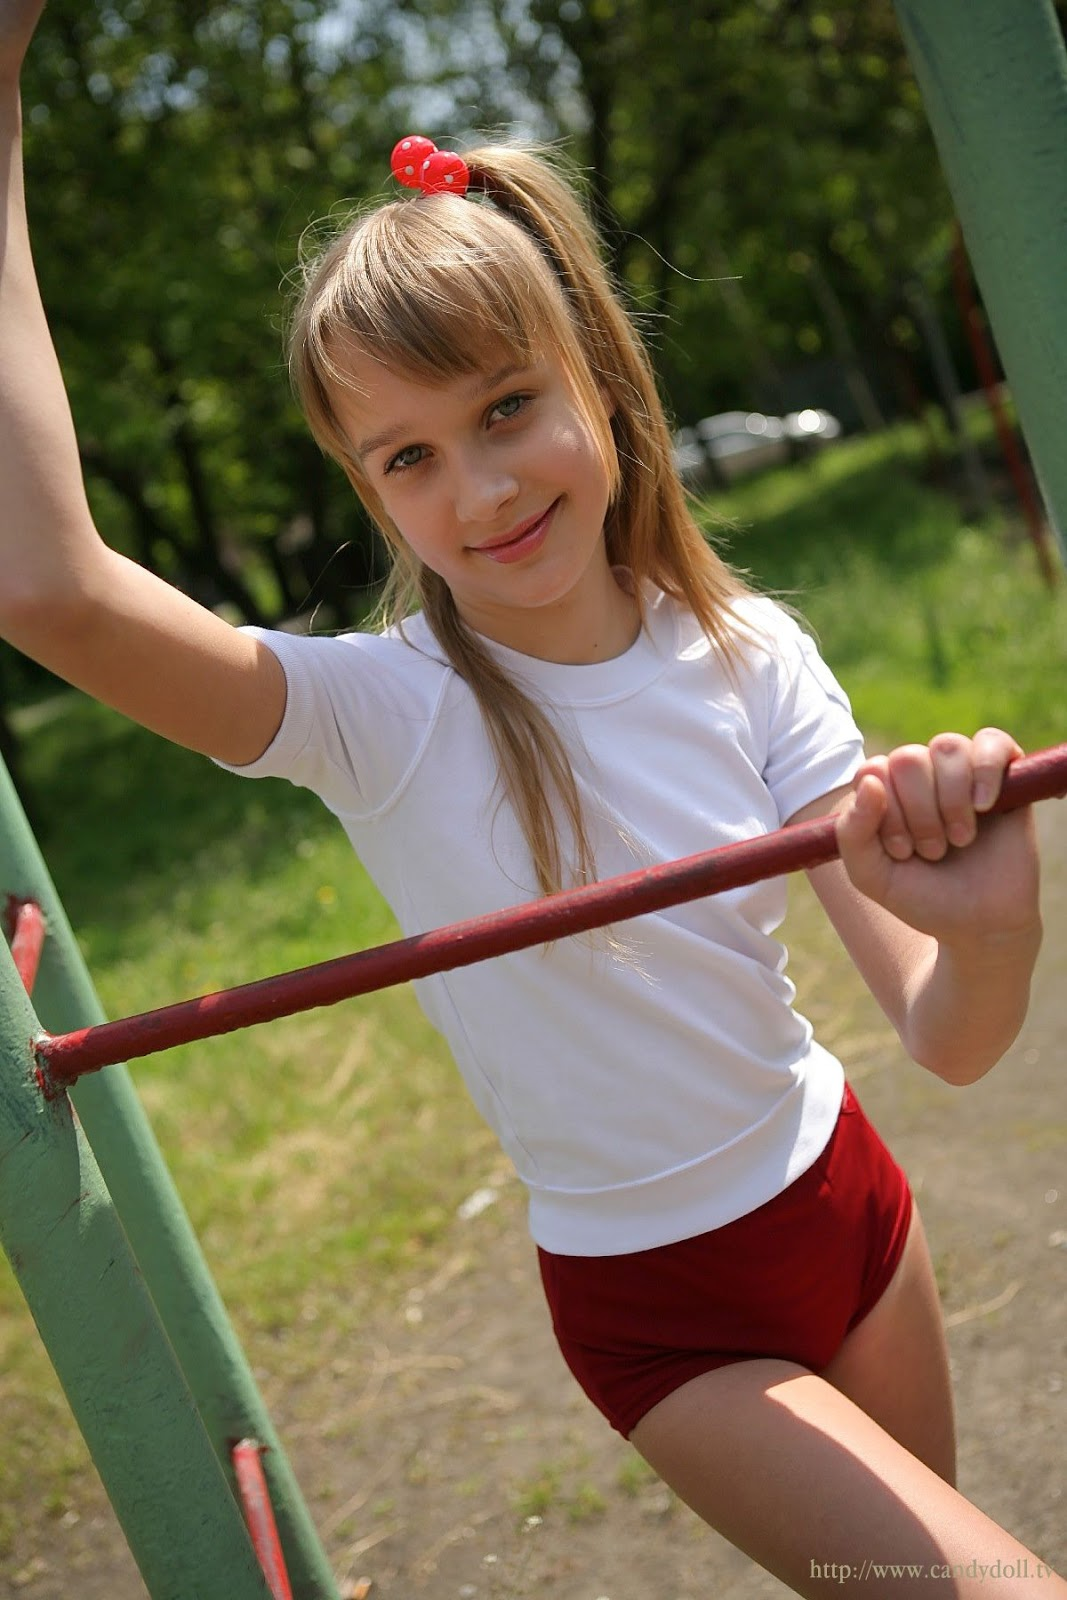 CANDYDOLL EVA R - SET 32 | Free hot girl pics